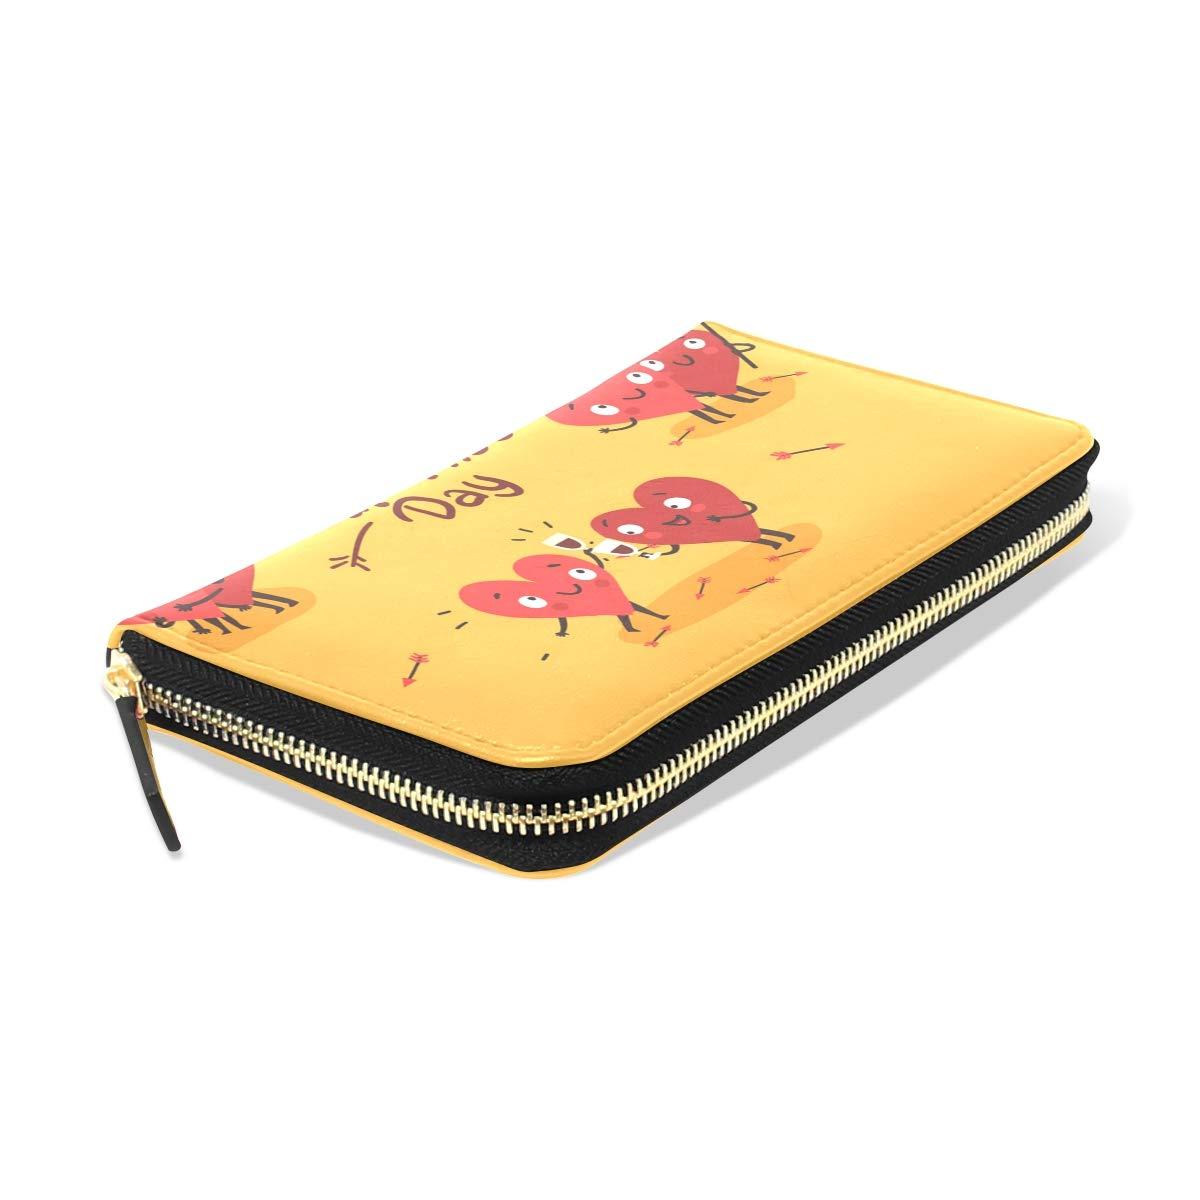 Womens Wallets Valentines Day Envelope Leather Passport Wallet Coin Purse Girls Handbags